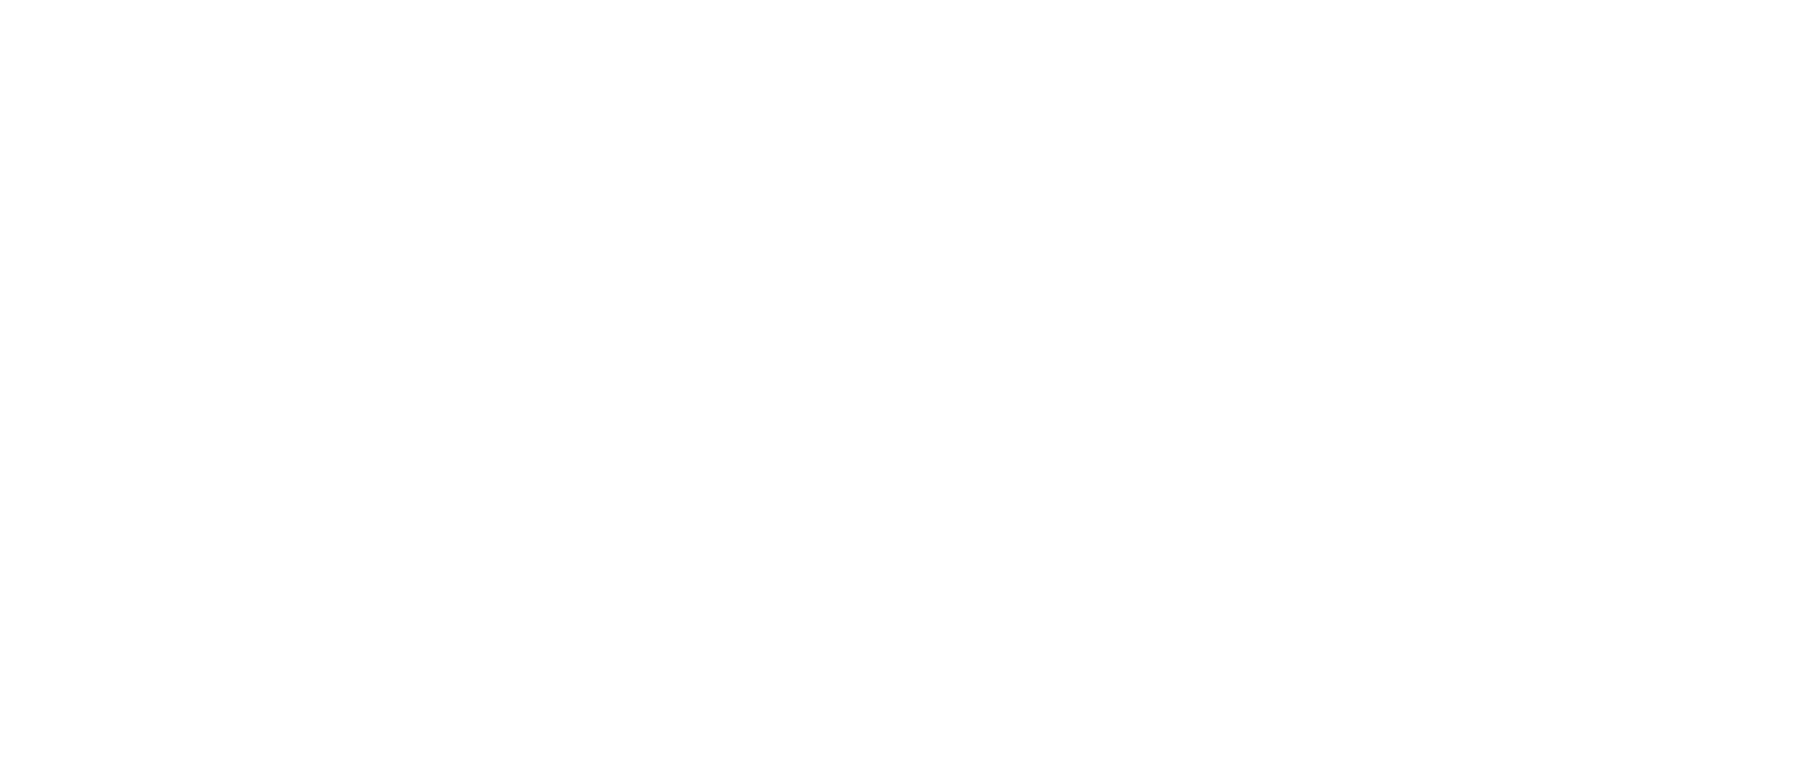 Activate Click